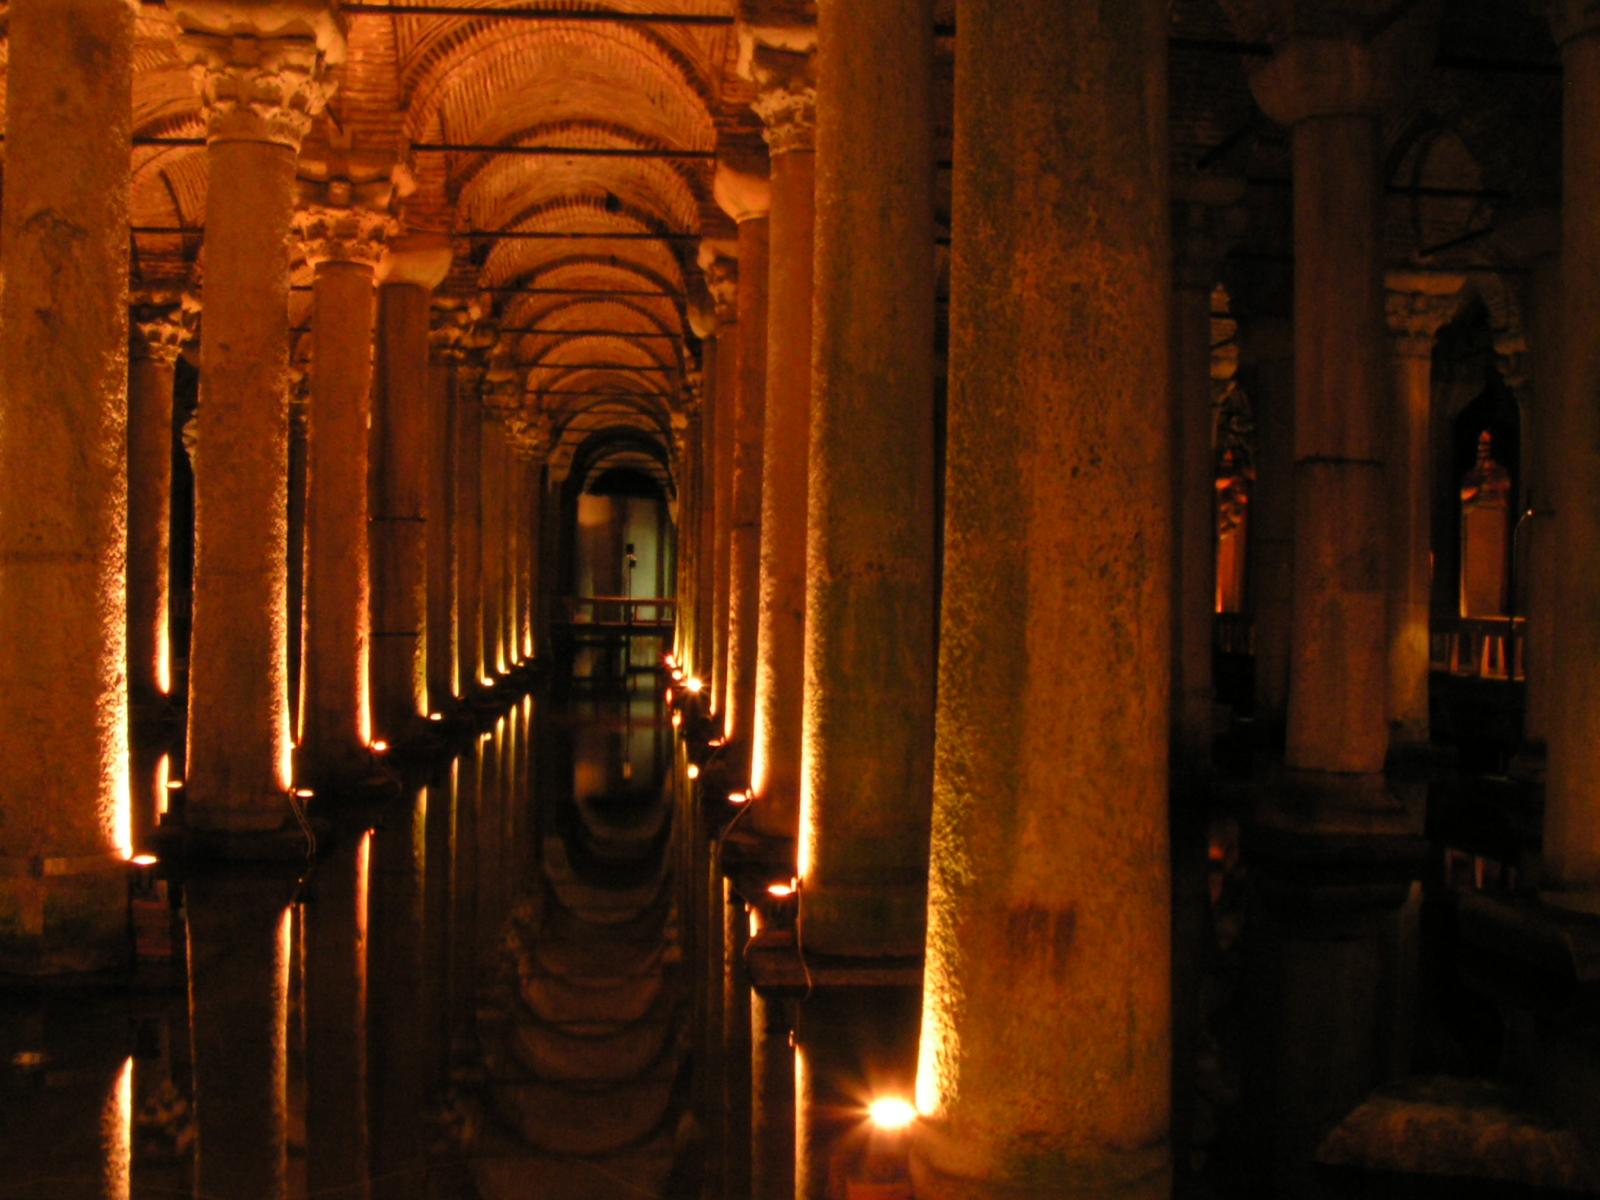 File:Istanbul - Basilica Cistern - 01.JPG - Wikipedia